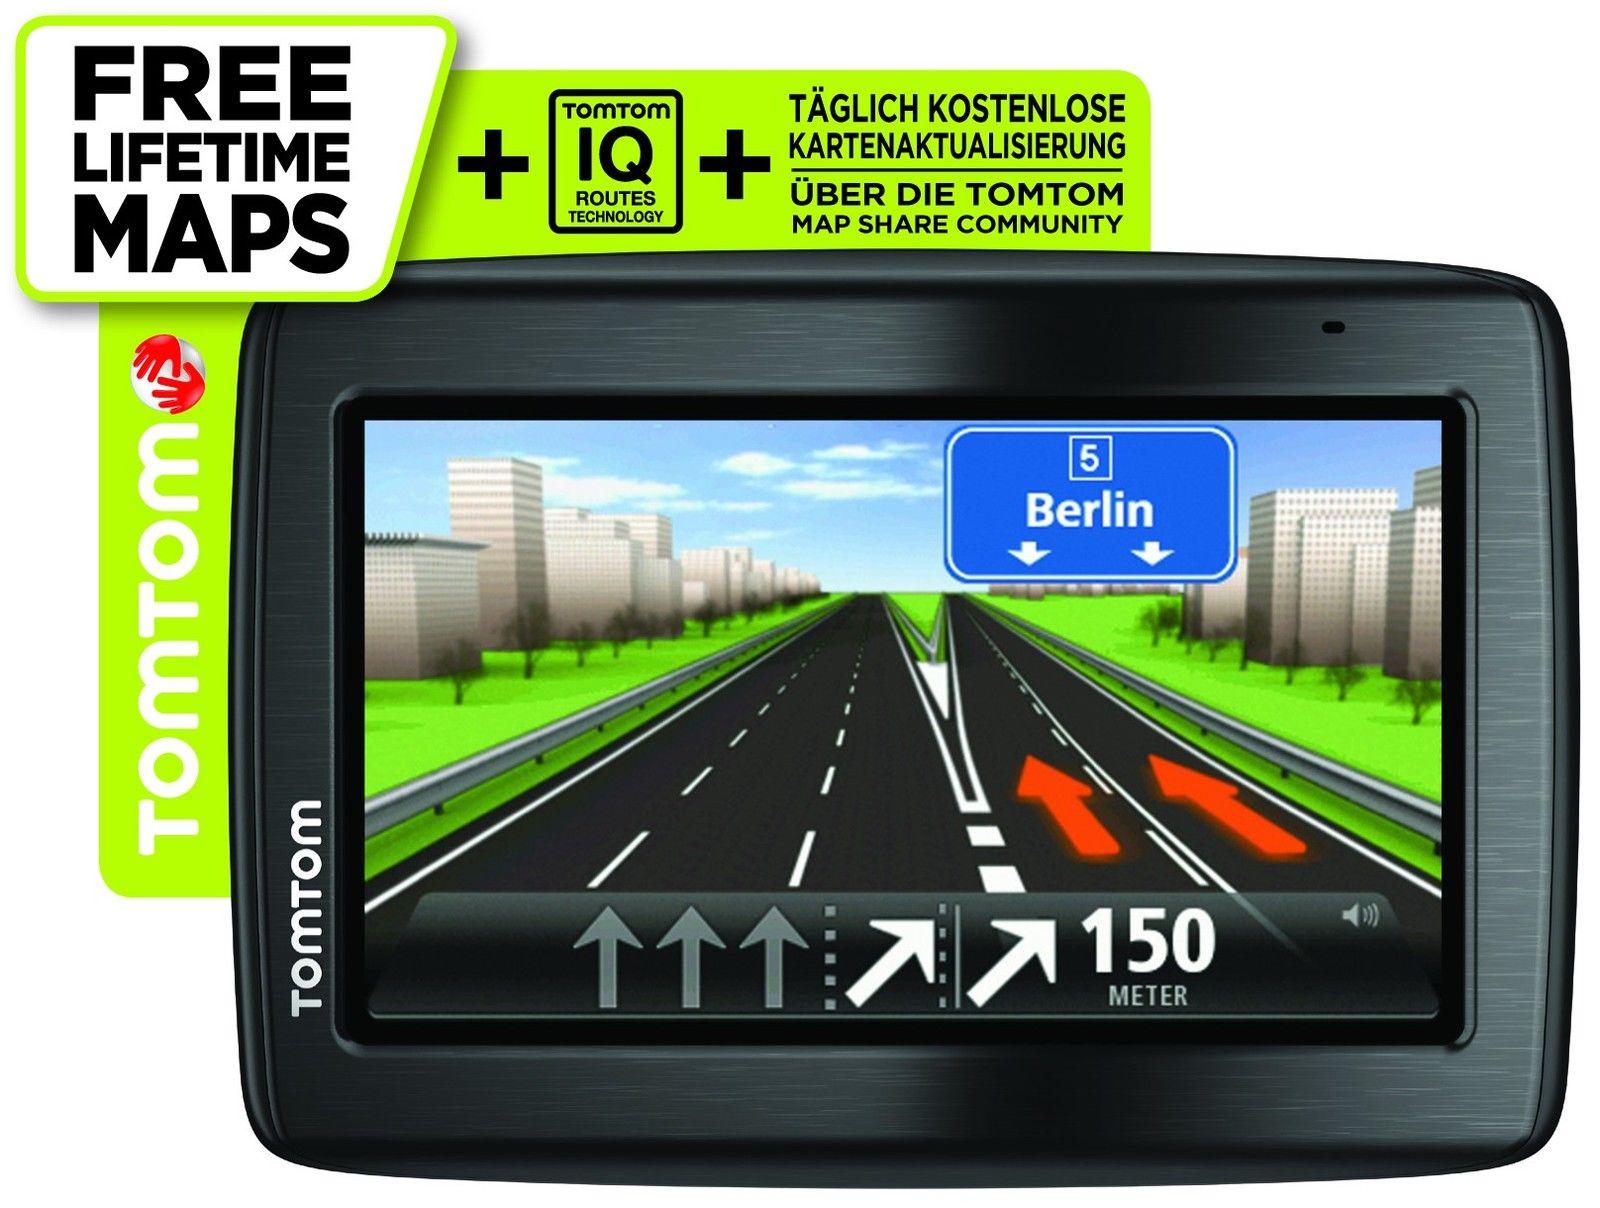 TomTom Via135M Central Europe Traffic Navigationssystem inkl FREE Lifetime Maps